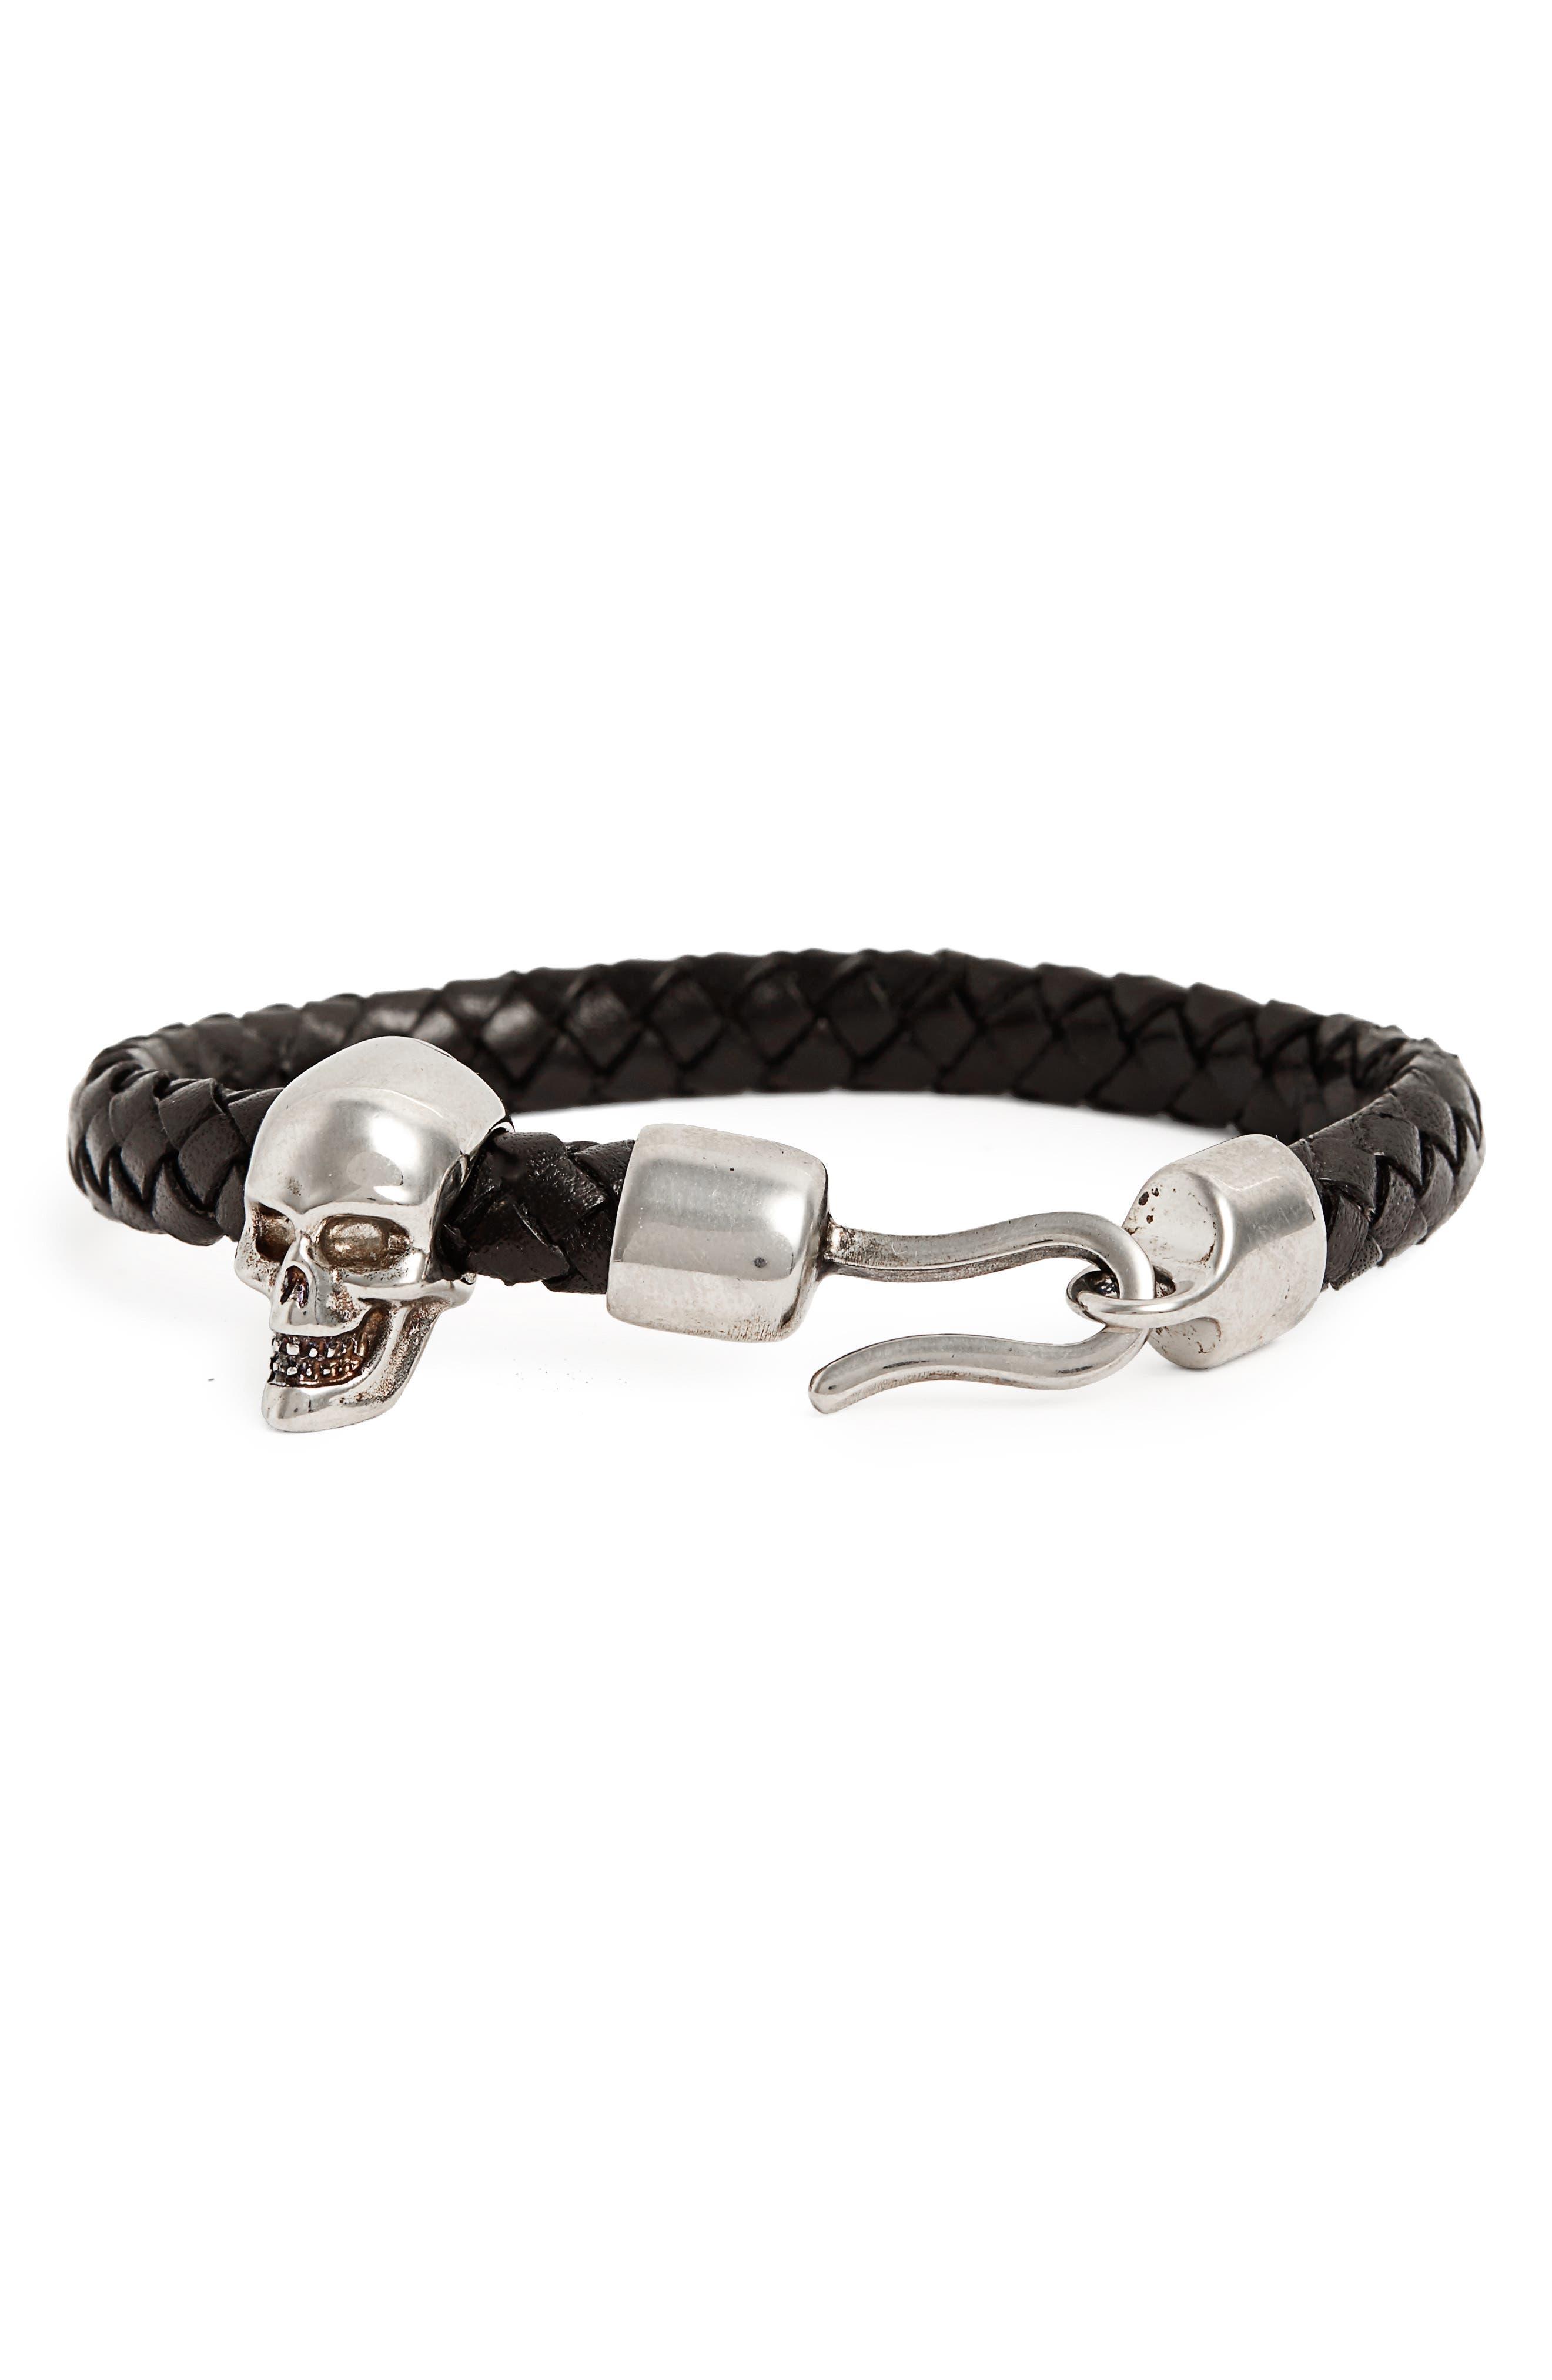 Brass Skull Leather Bracelet,                         Main,                         color, Black